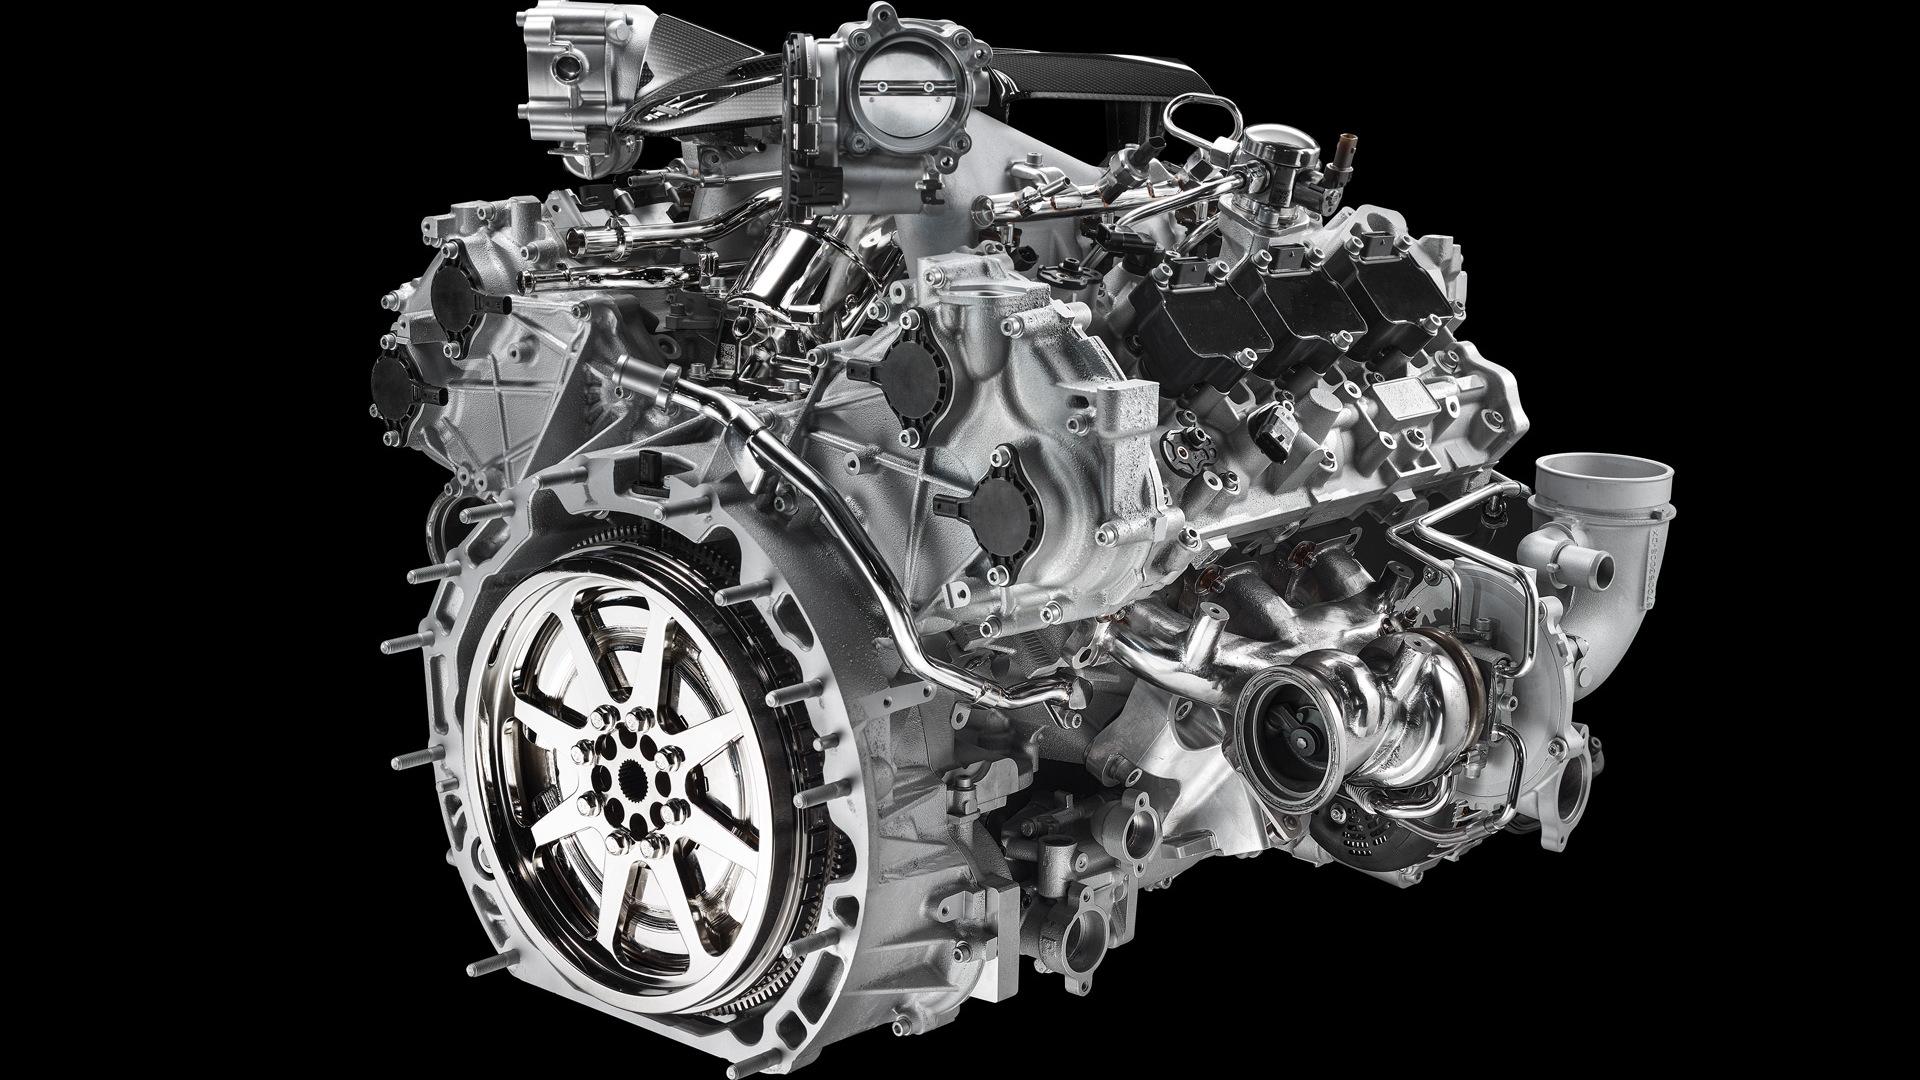 Maserati Nettuno 3.0-liter twin-turbocharged V-6